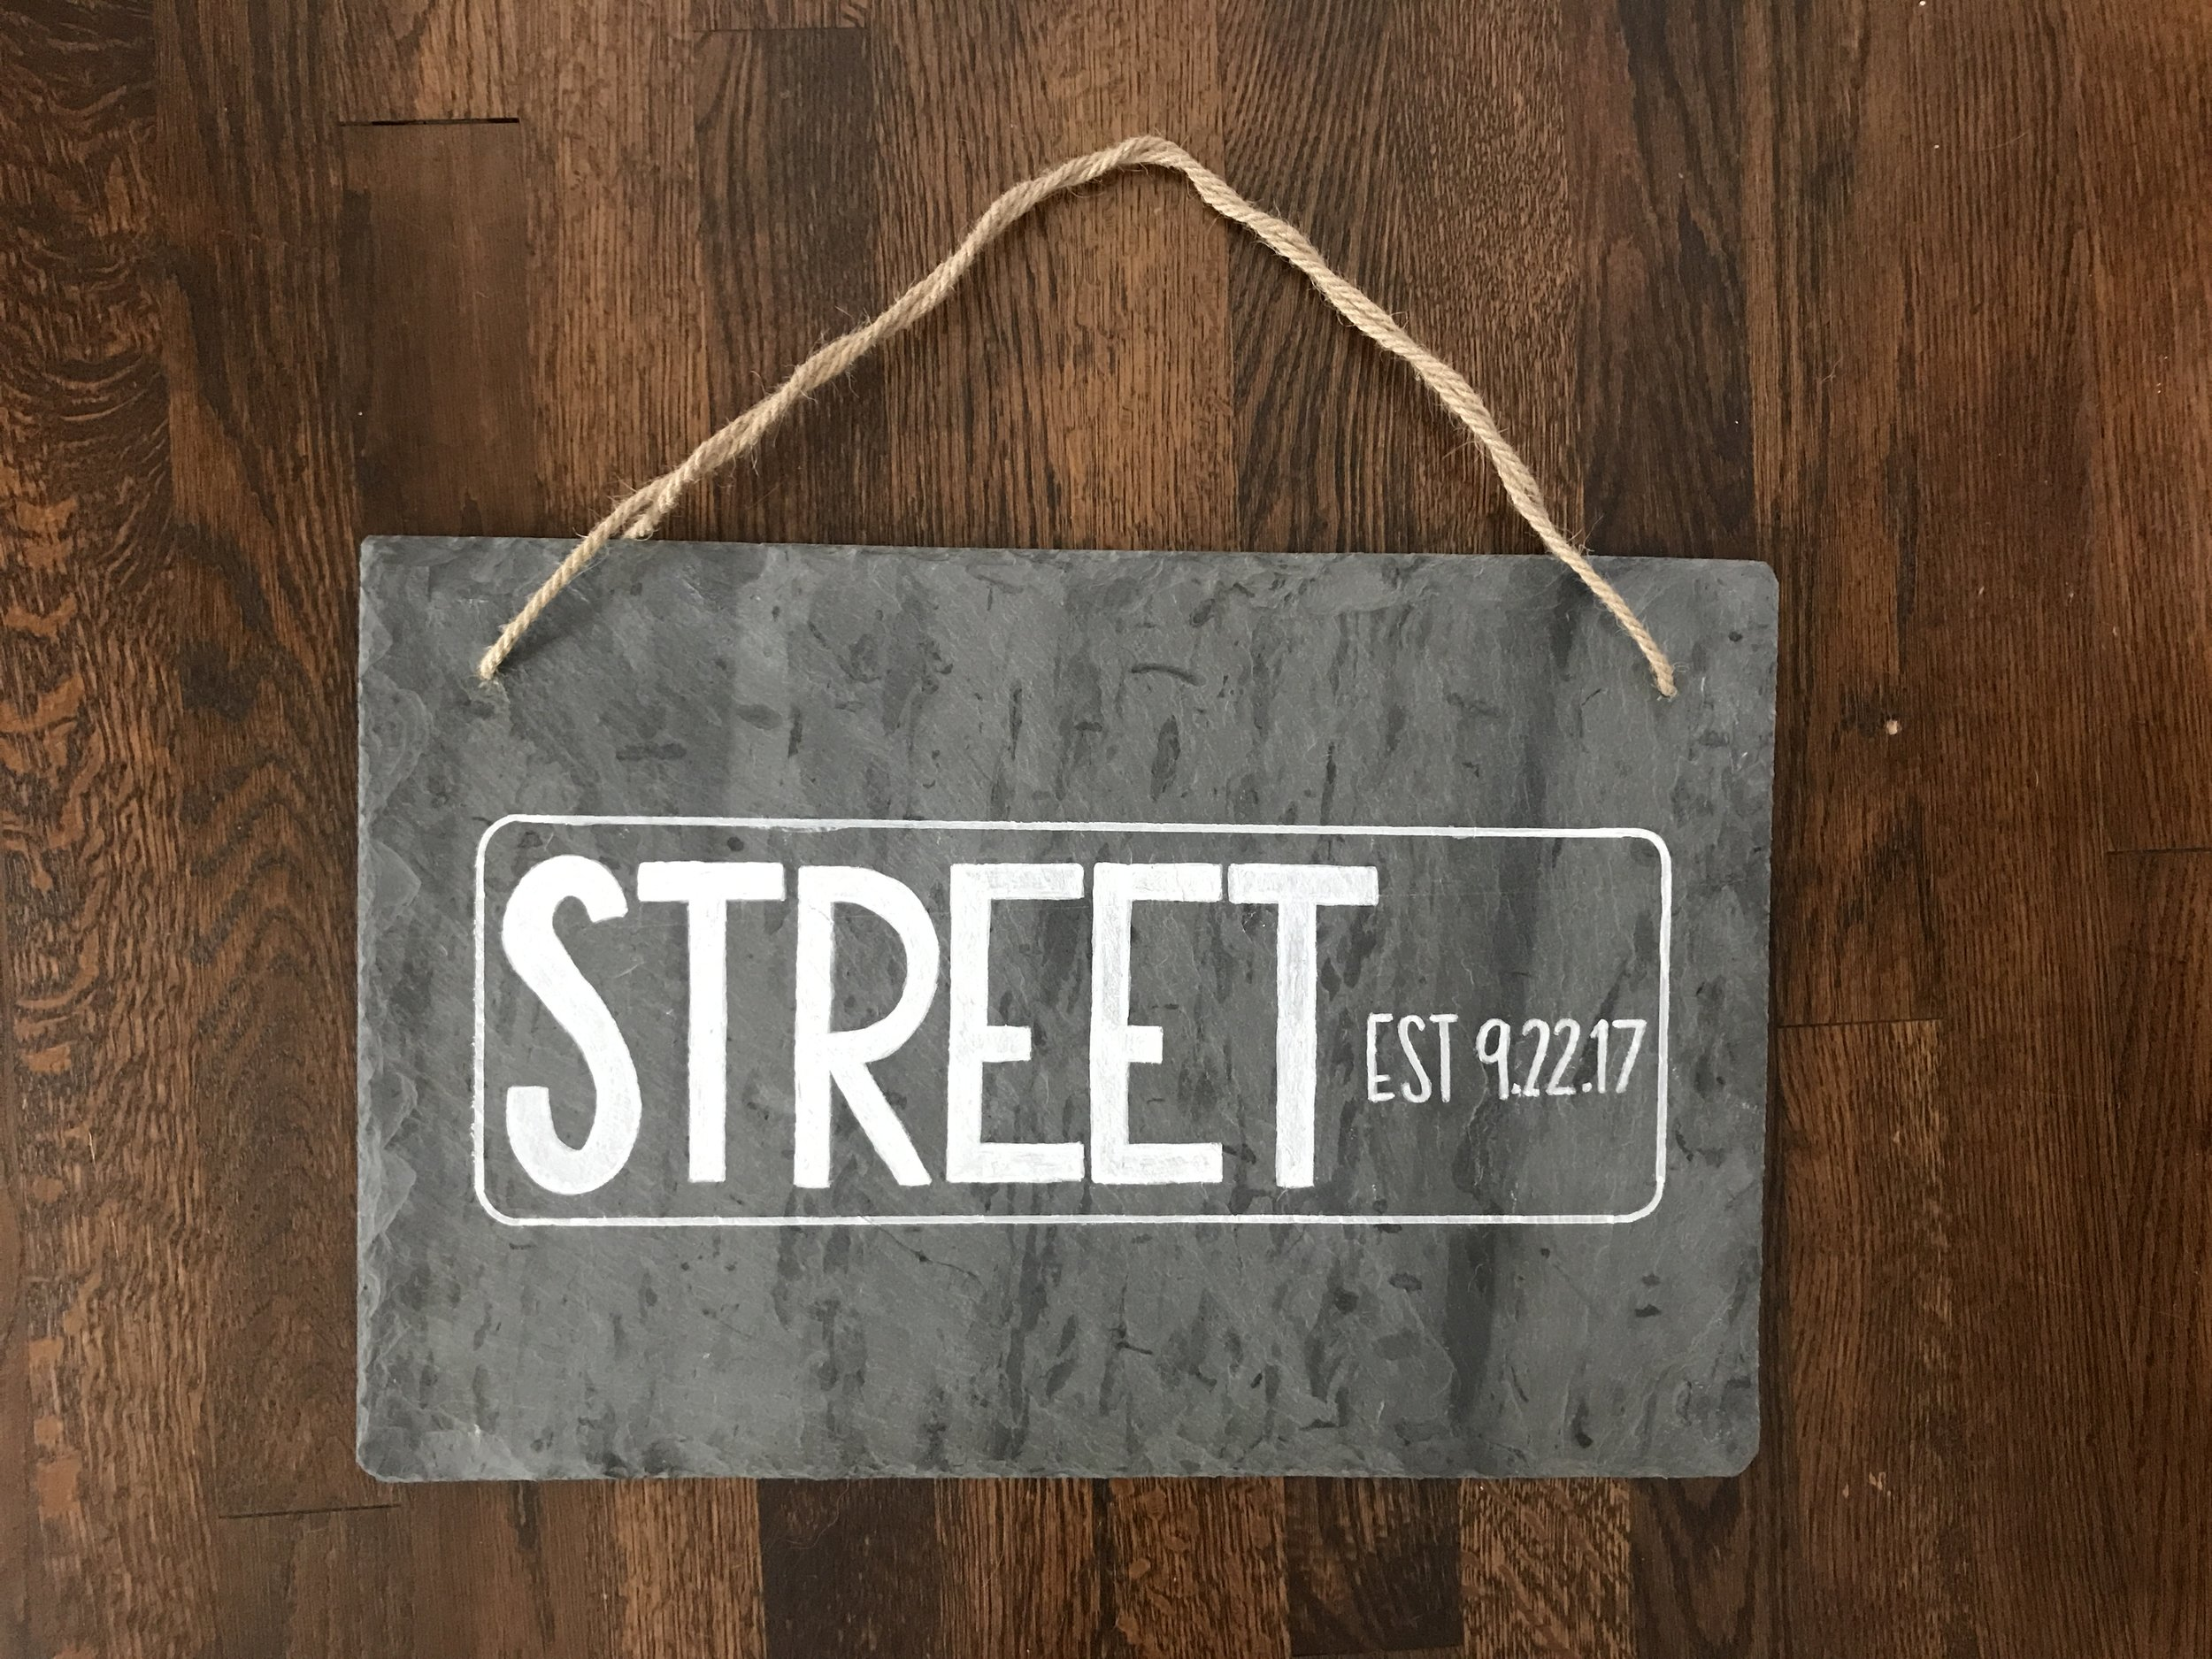 street.jpeg